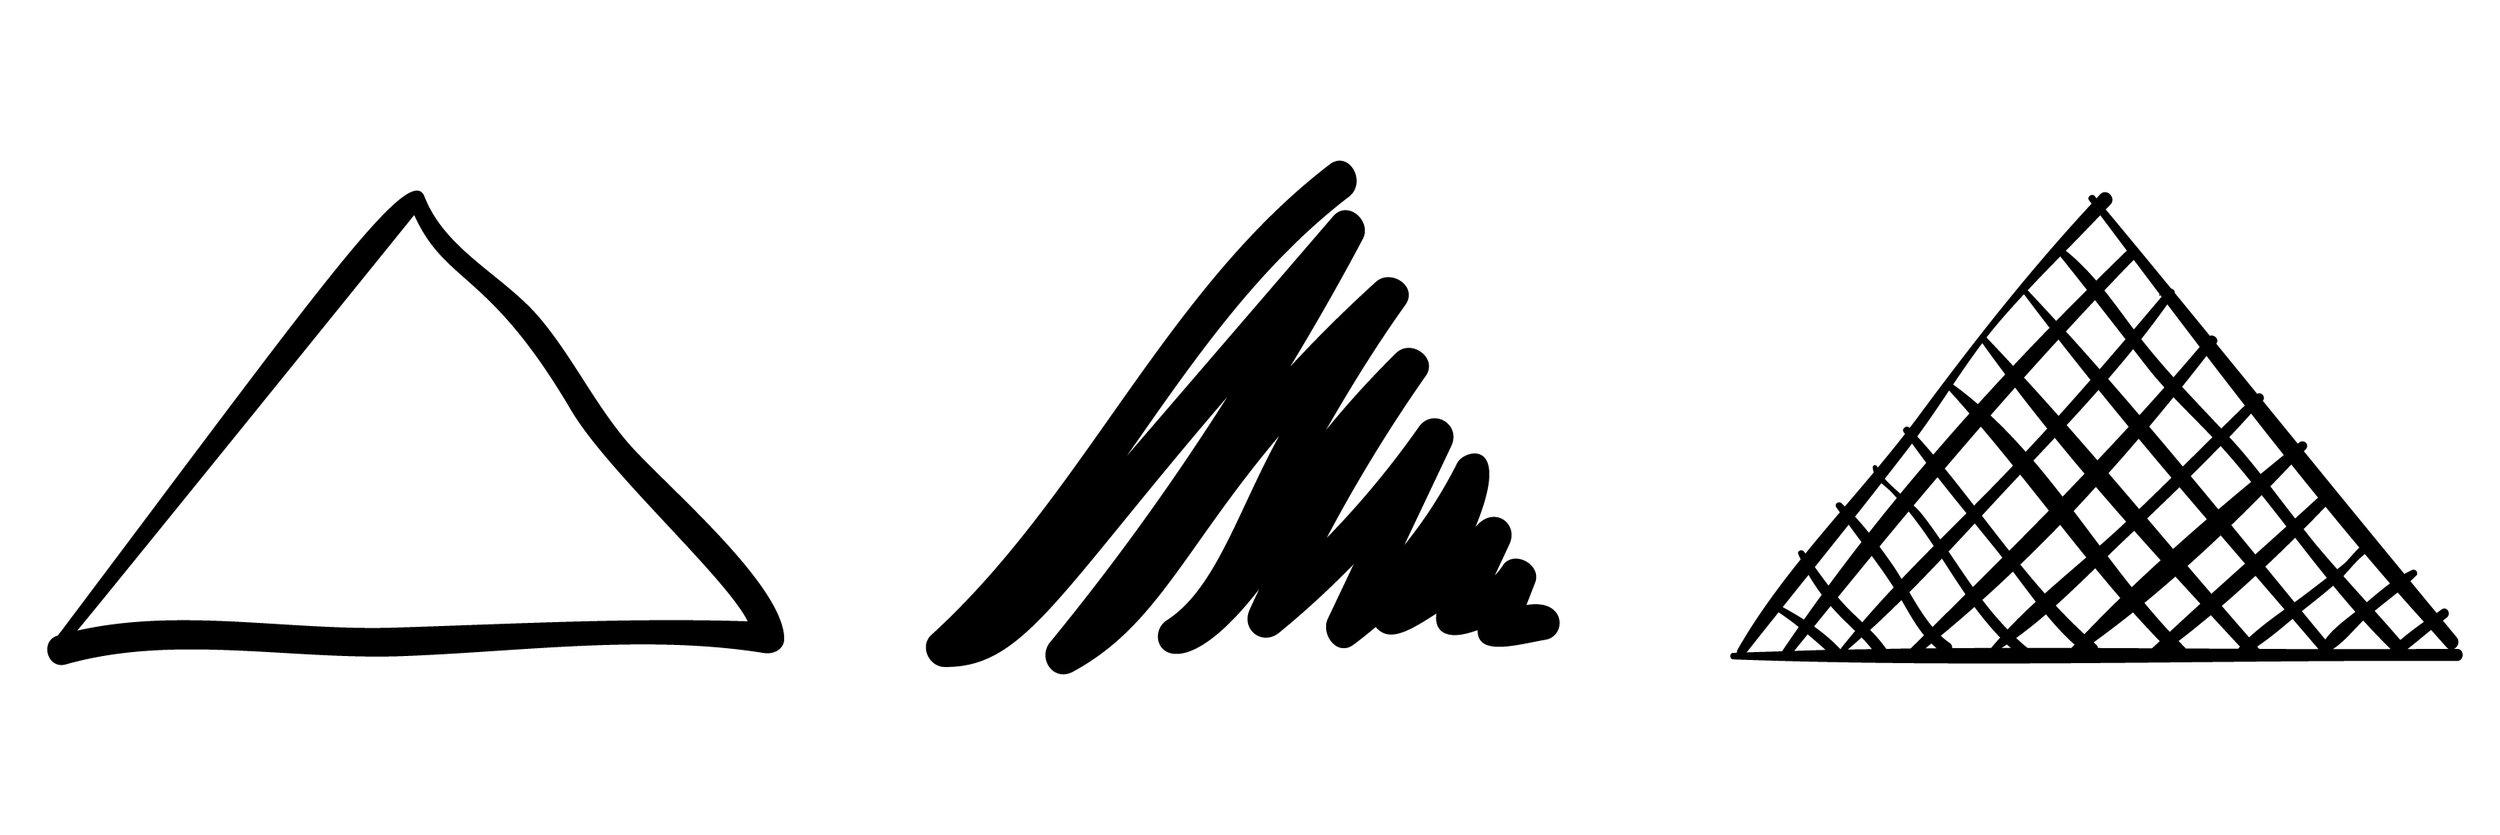 triangulos1.jpg